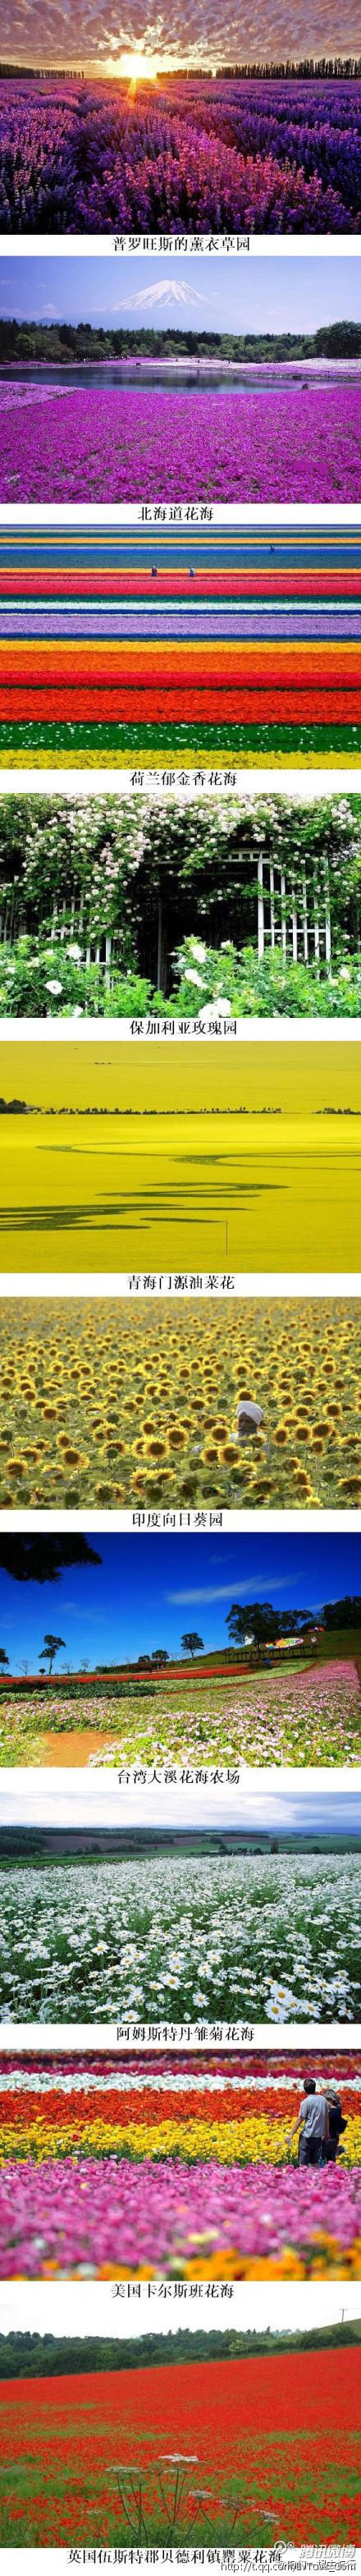 The World S Top Ten Beautiful Flowers Garden Travelling